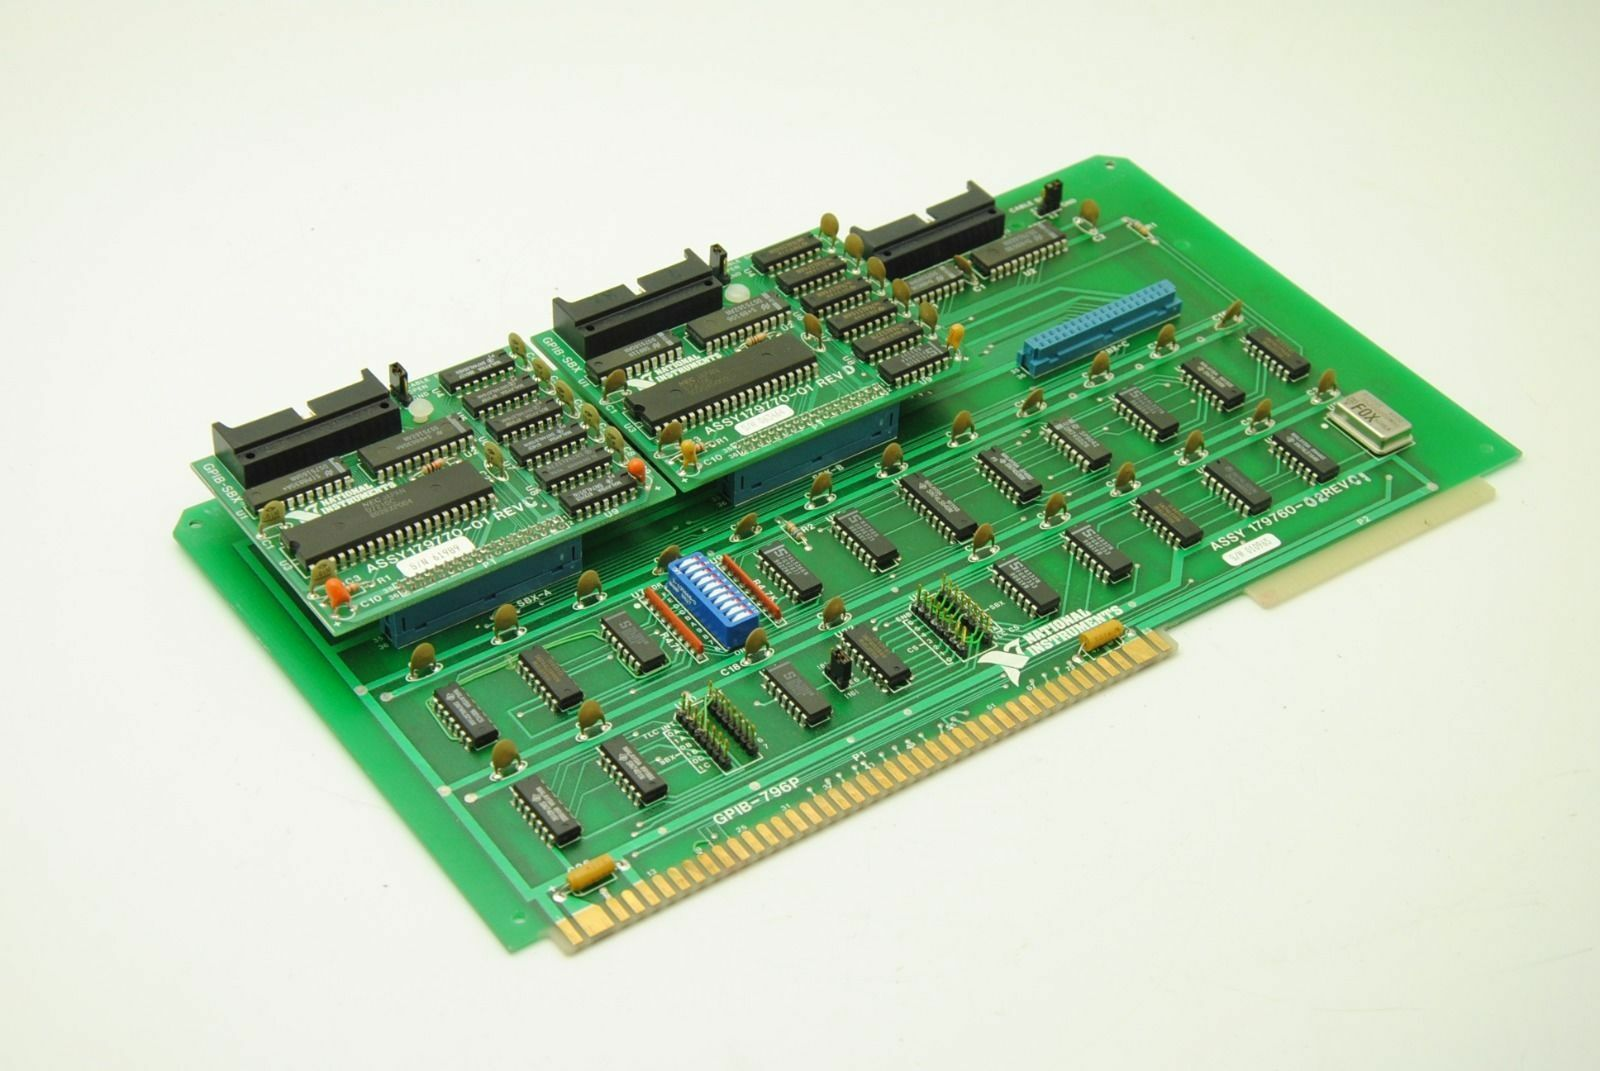 National Instruments GPIB-796B 179760-02 Rev 01, 179770-01 Rev C & Rev D